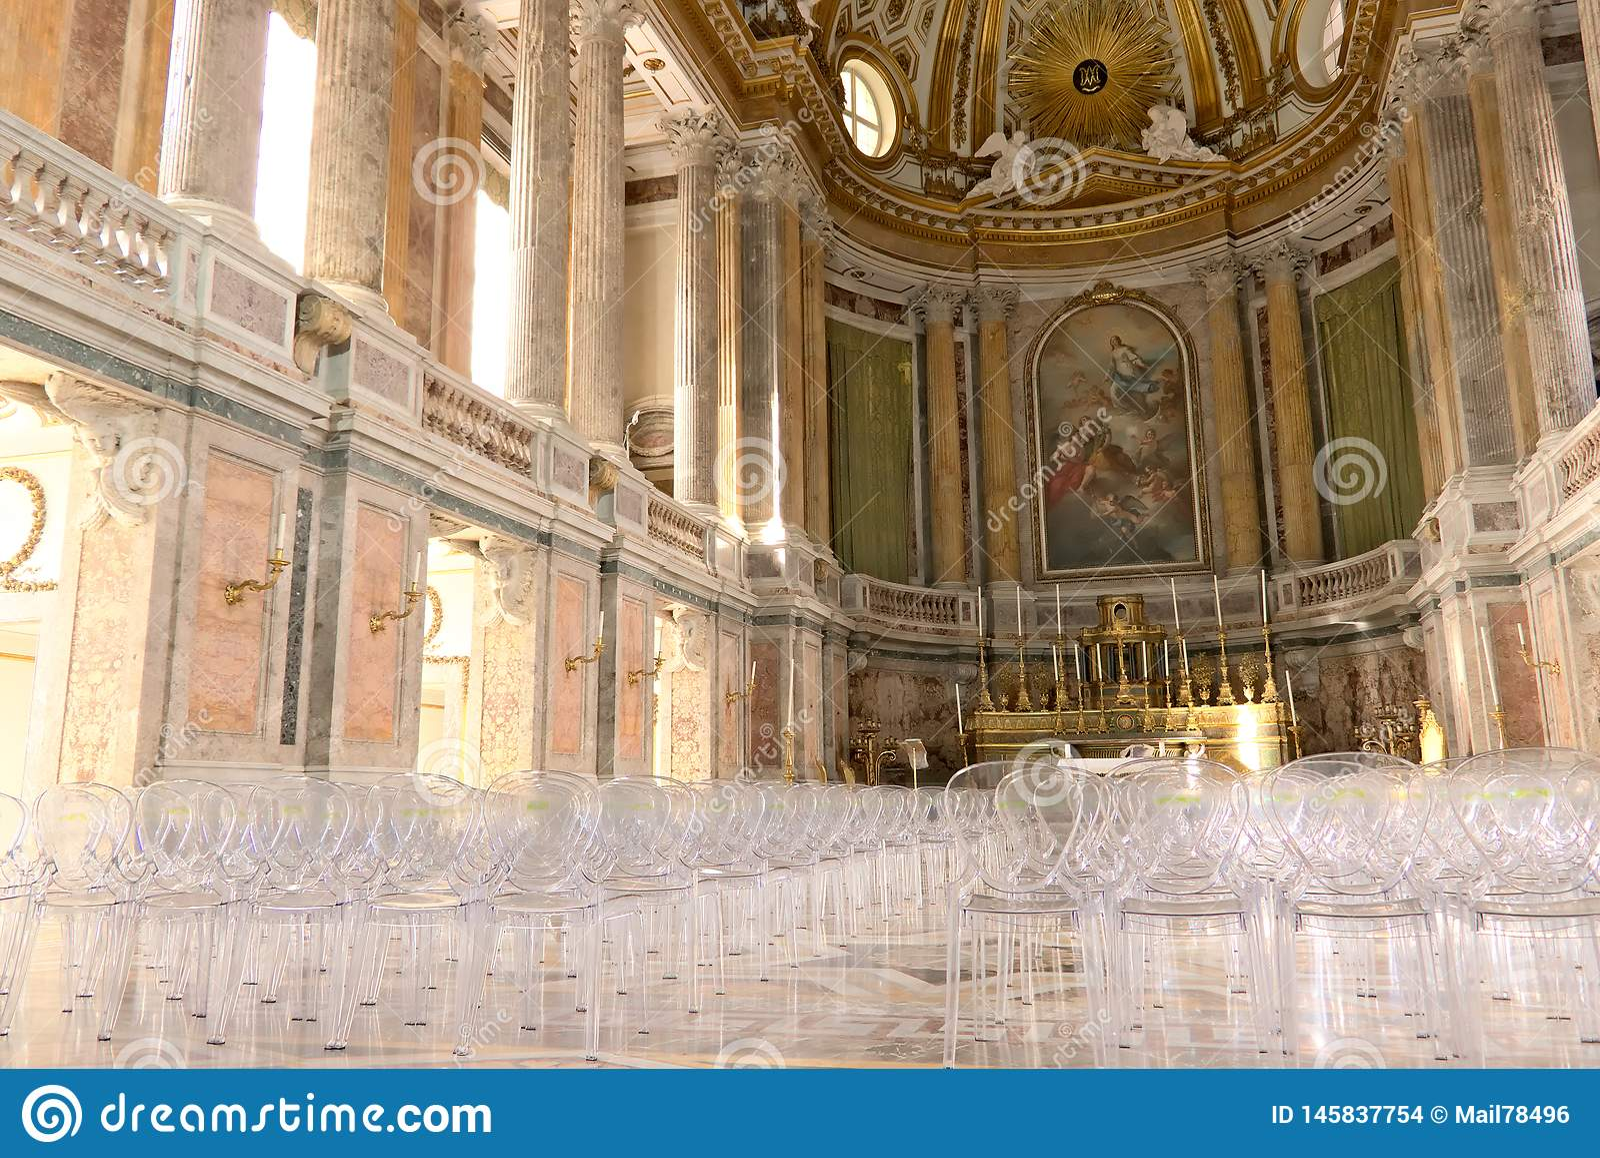 Di Caserta, Ιταλία Reggia 10/27/2018 Εσωτερικό του παρεκκλησιού μέσα στο παλάτι Σύγχρονες καρέκλες πλεξιγκλάς